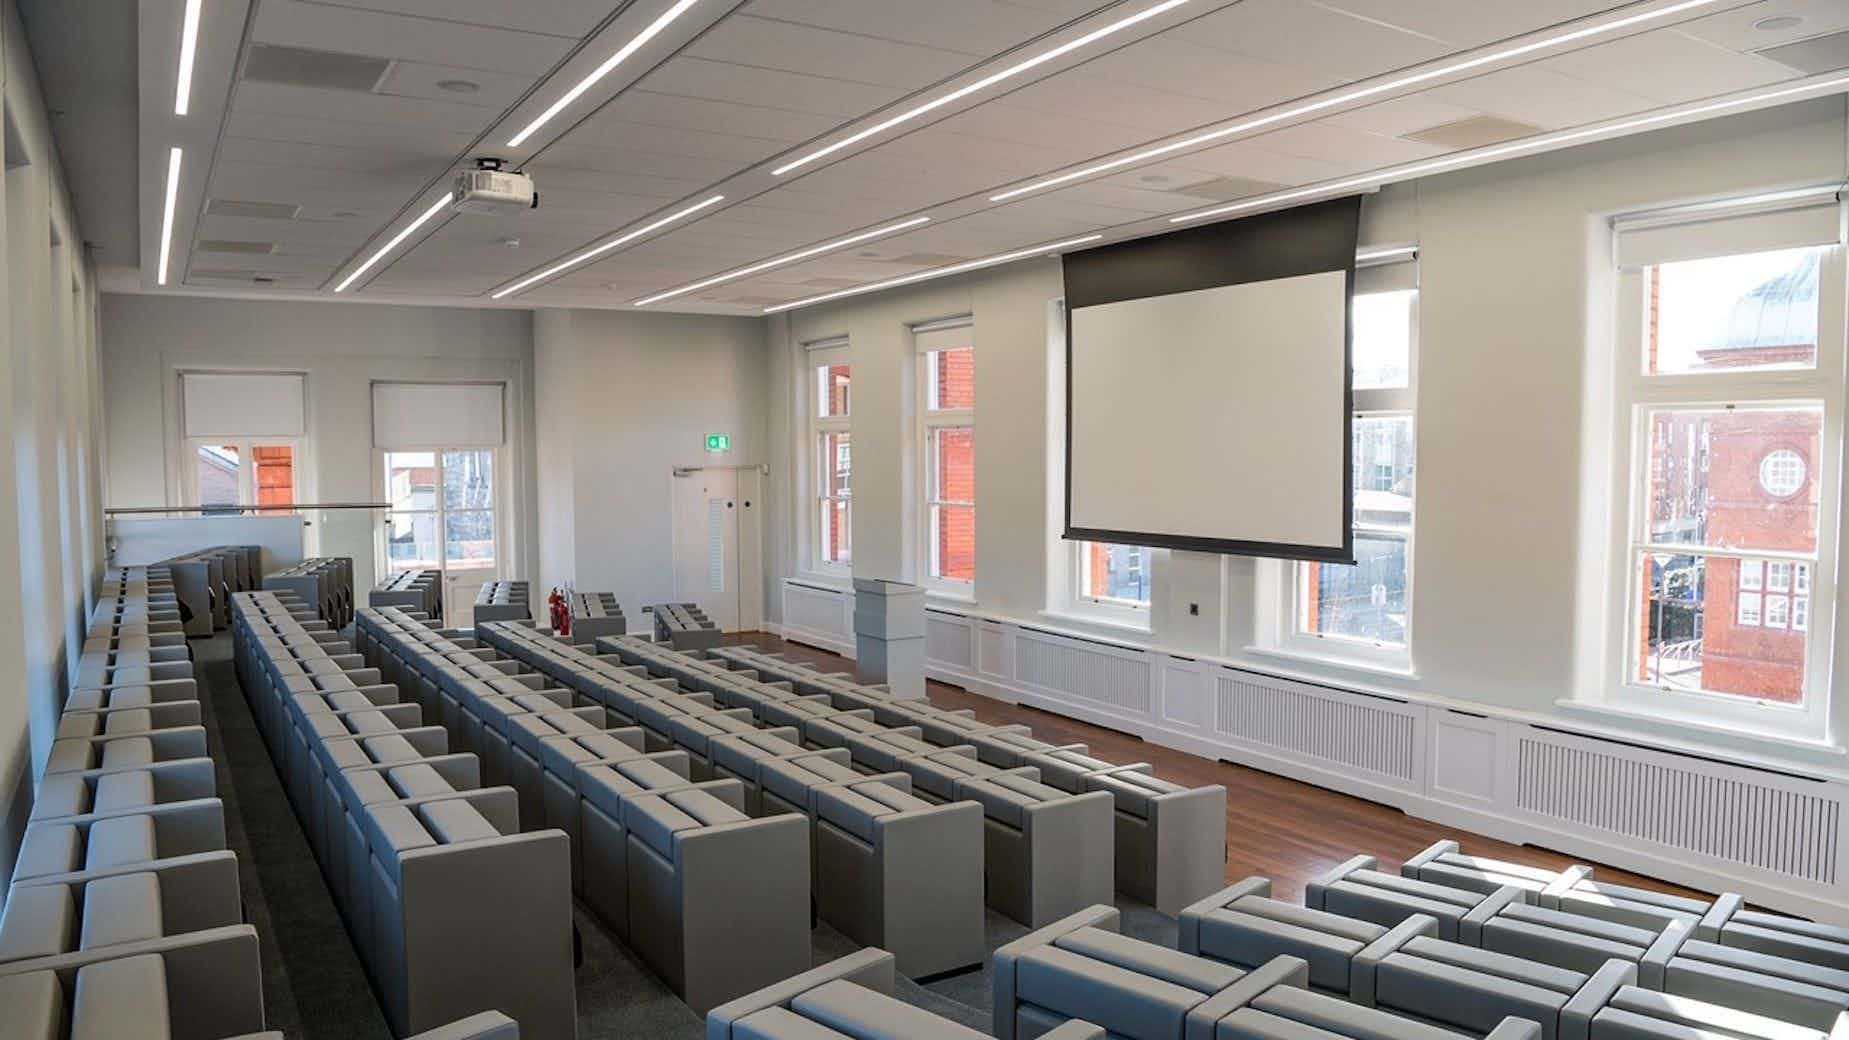 Auditorium, The Richmond Education and Event Centre